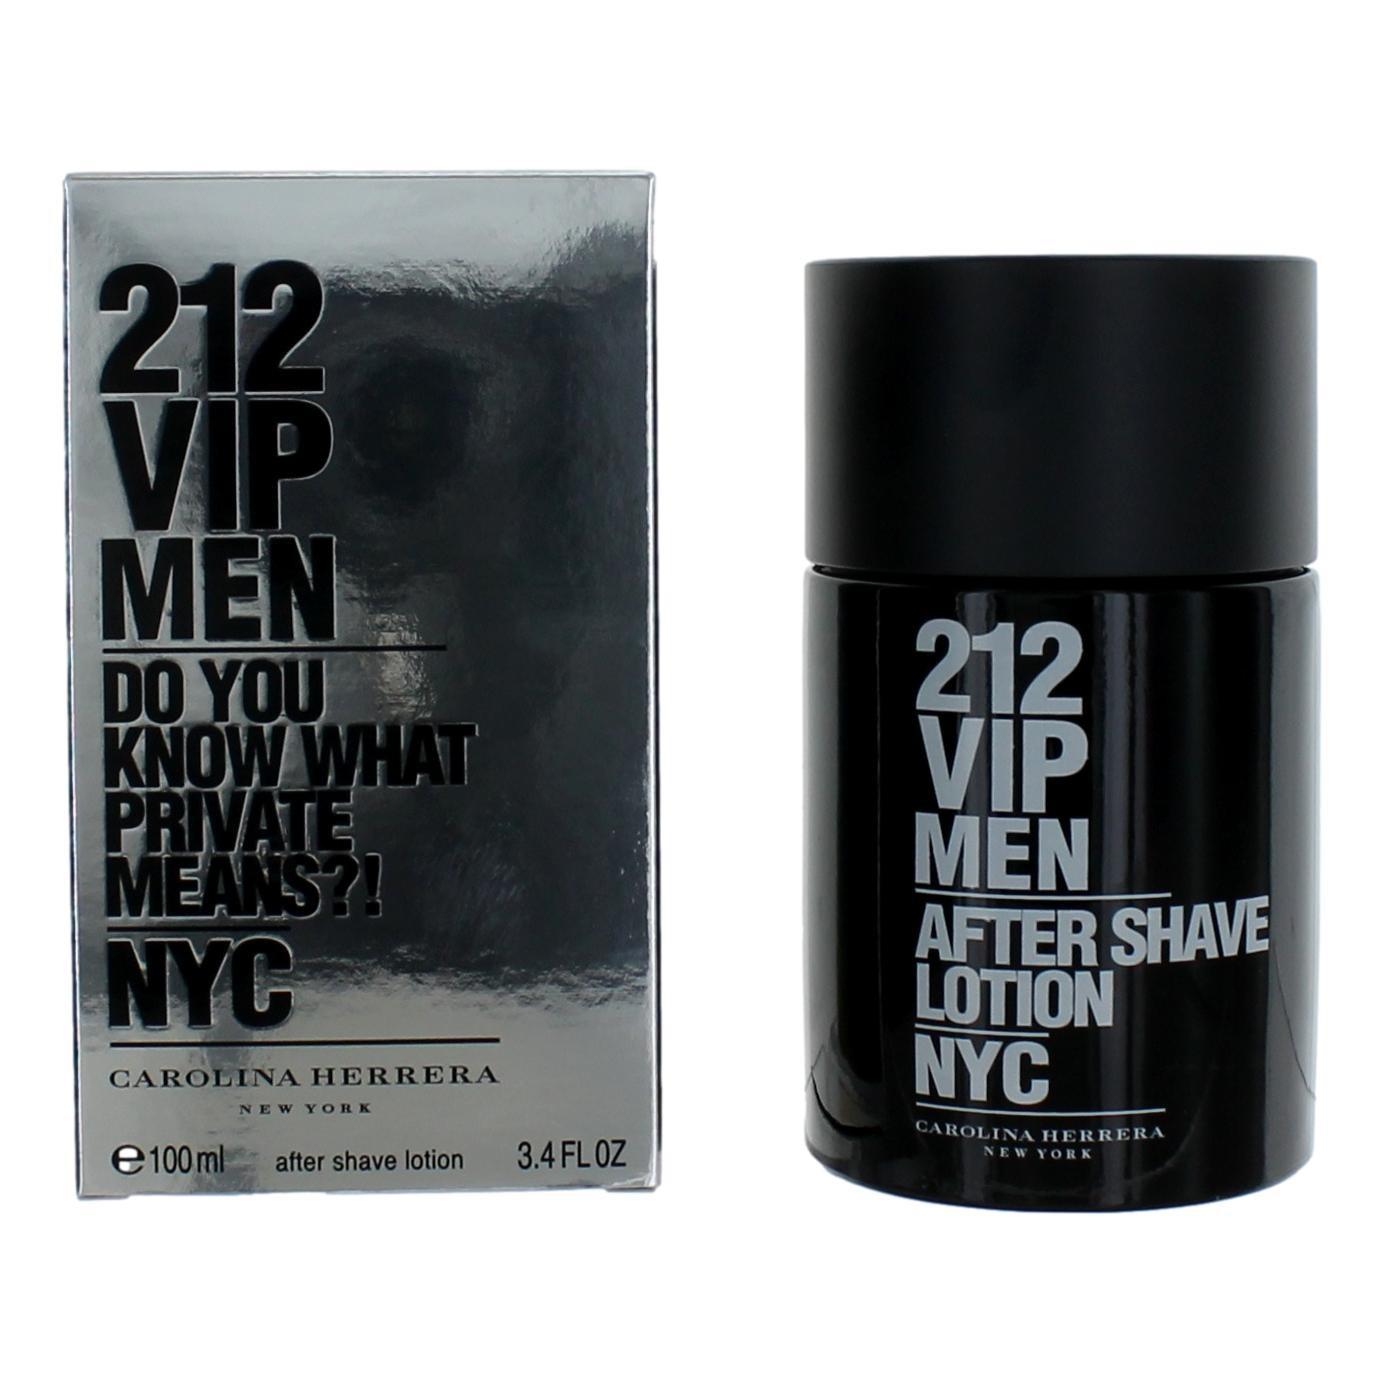 212 VIP by Carolina Herrera, 3.4 oz After Shave for Men